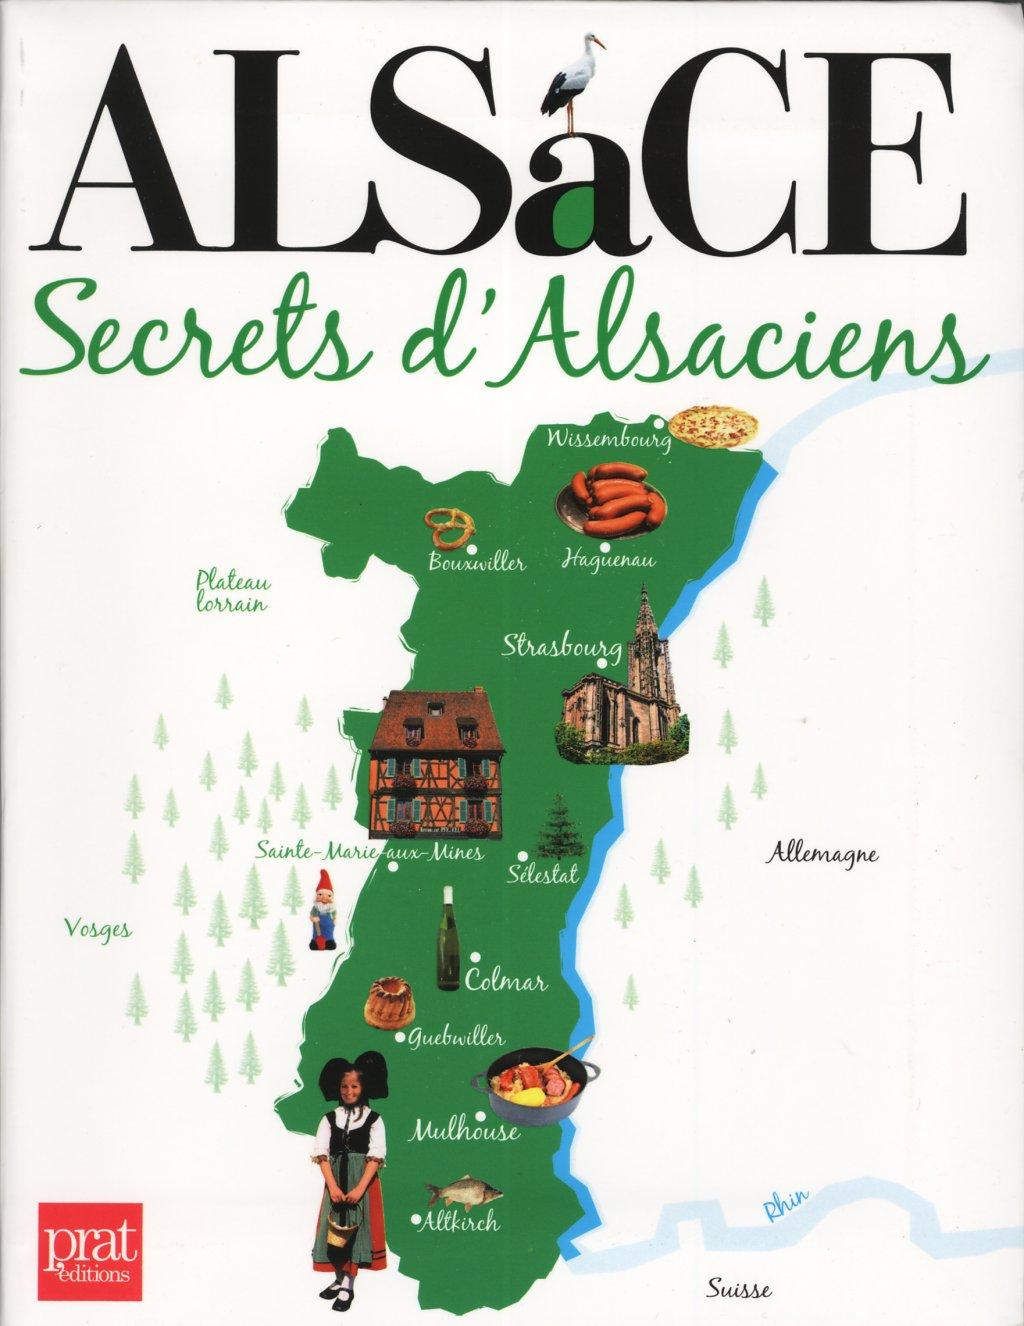 ALSACE SECRETS ALSACIENS